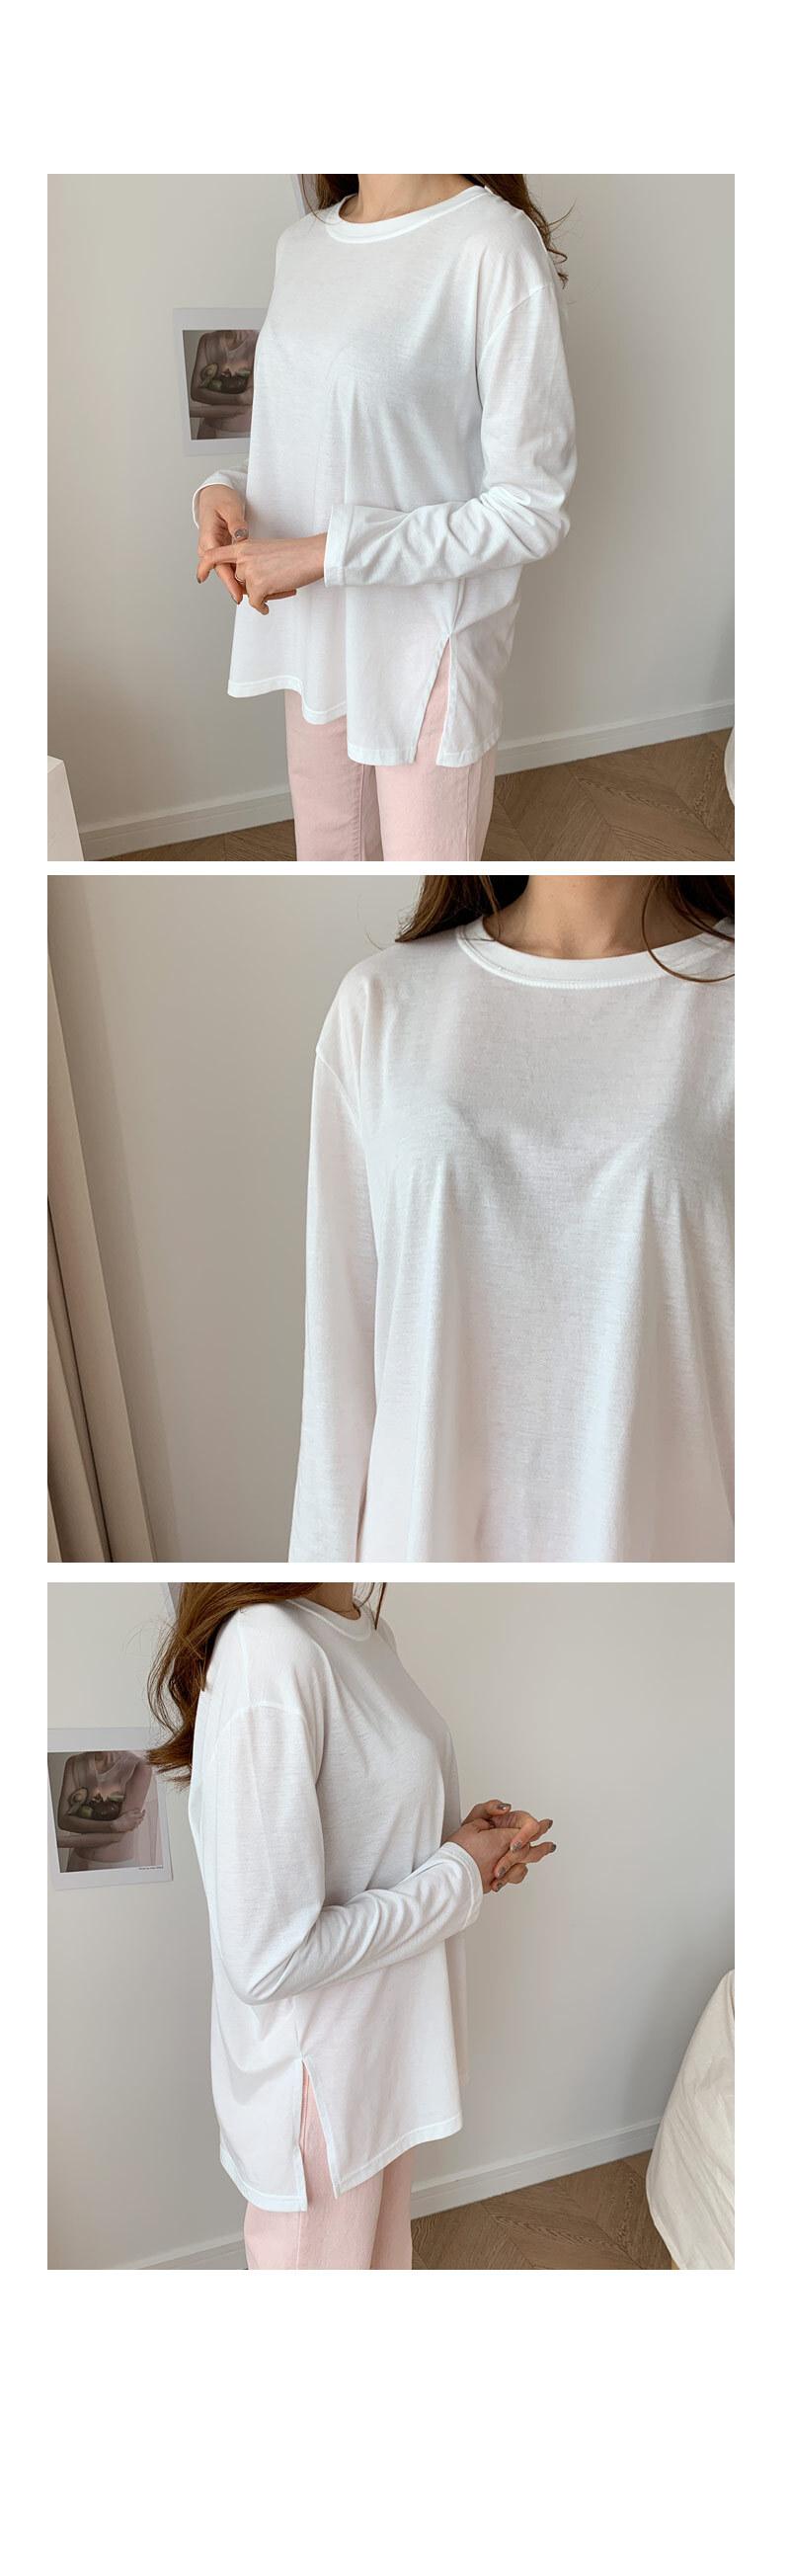 Armand Trim Long-sleeved T-shirt